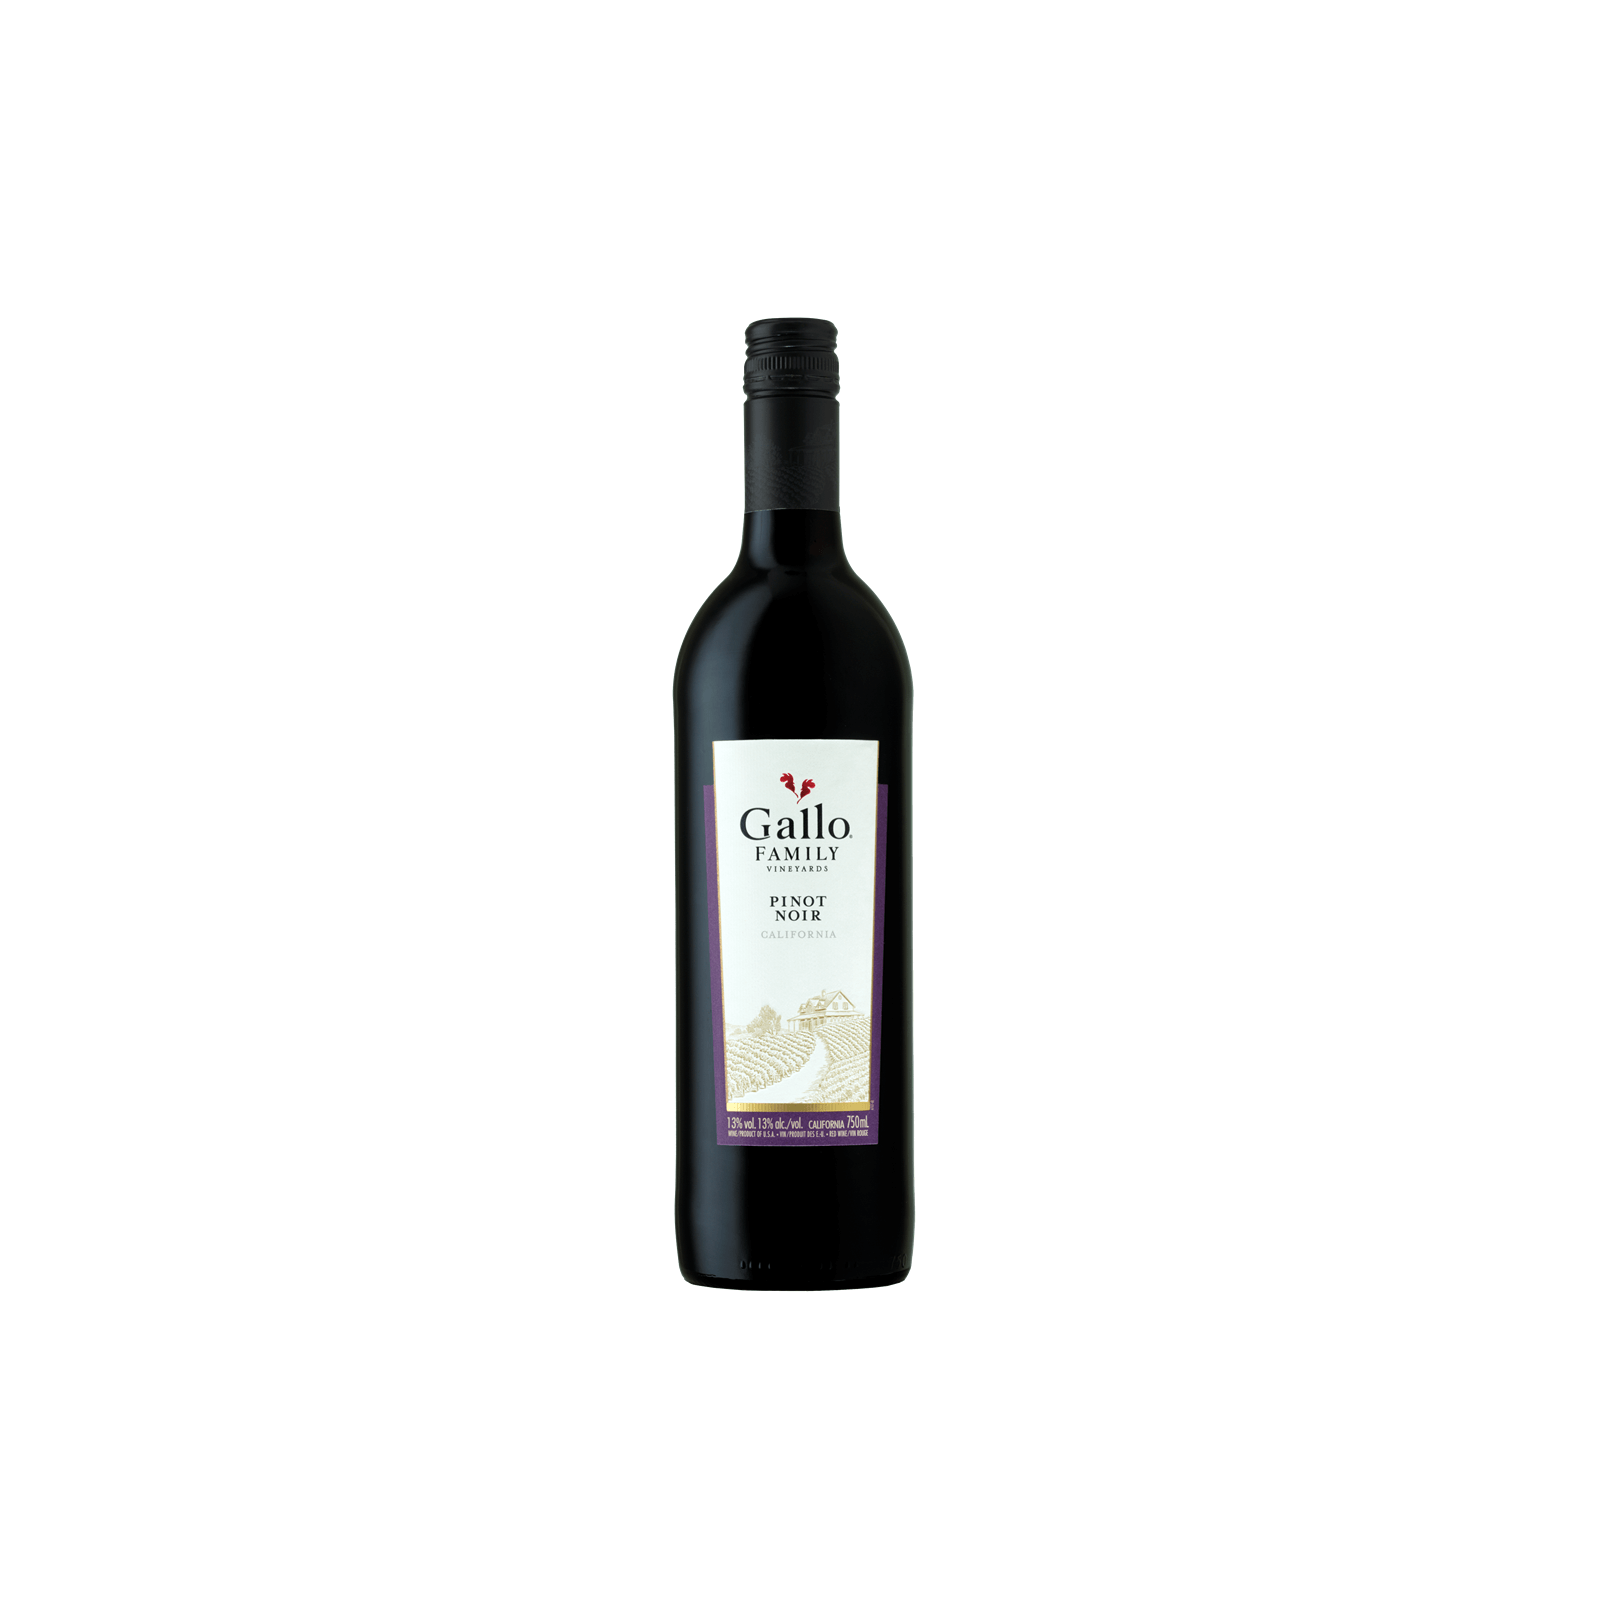 Gallo Family Pinot Noir